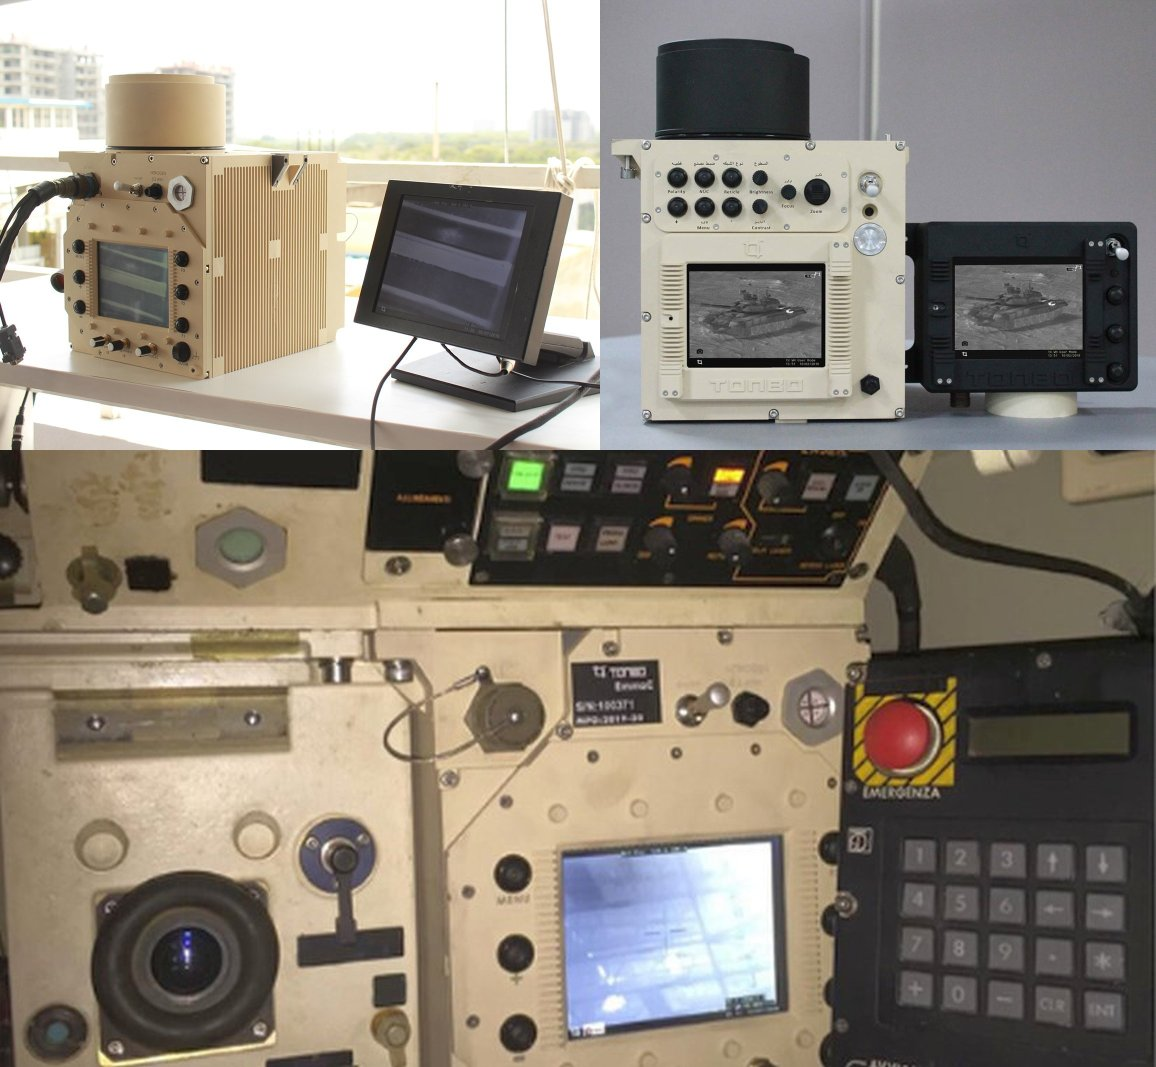 Emma-C Thermal Imaging Sight System - Tonbo Imaging - 01